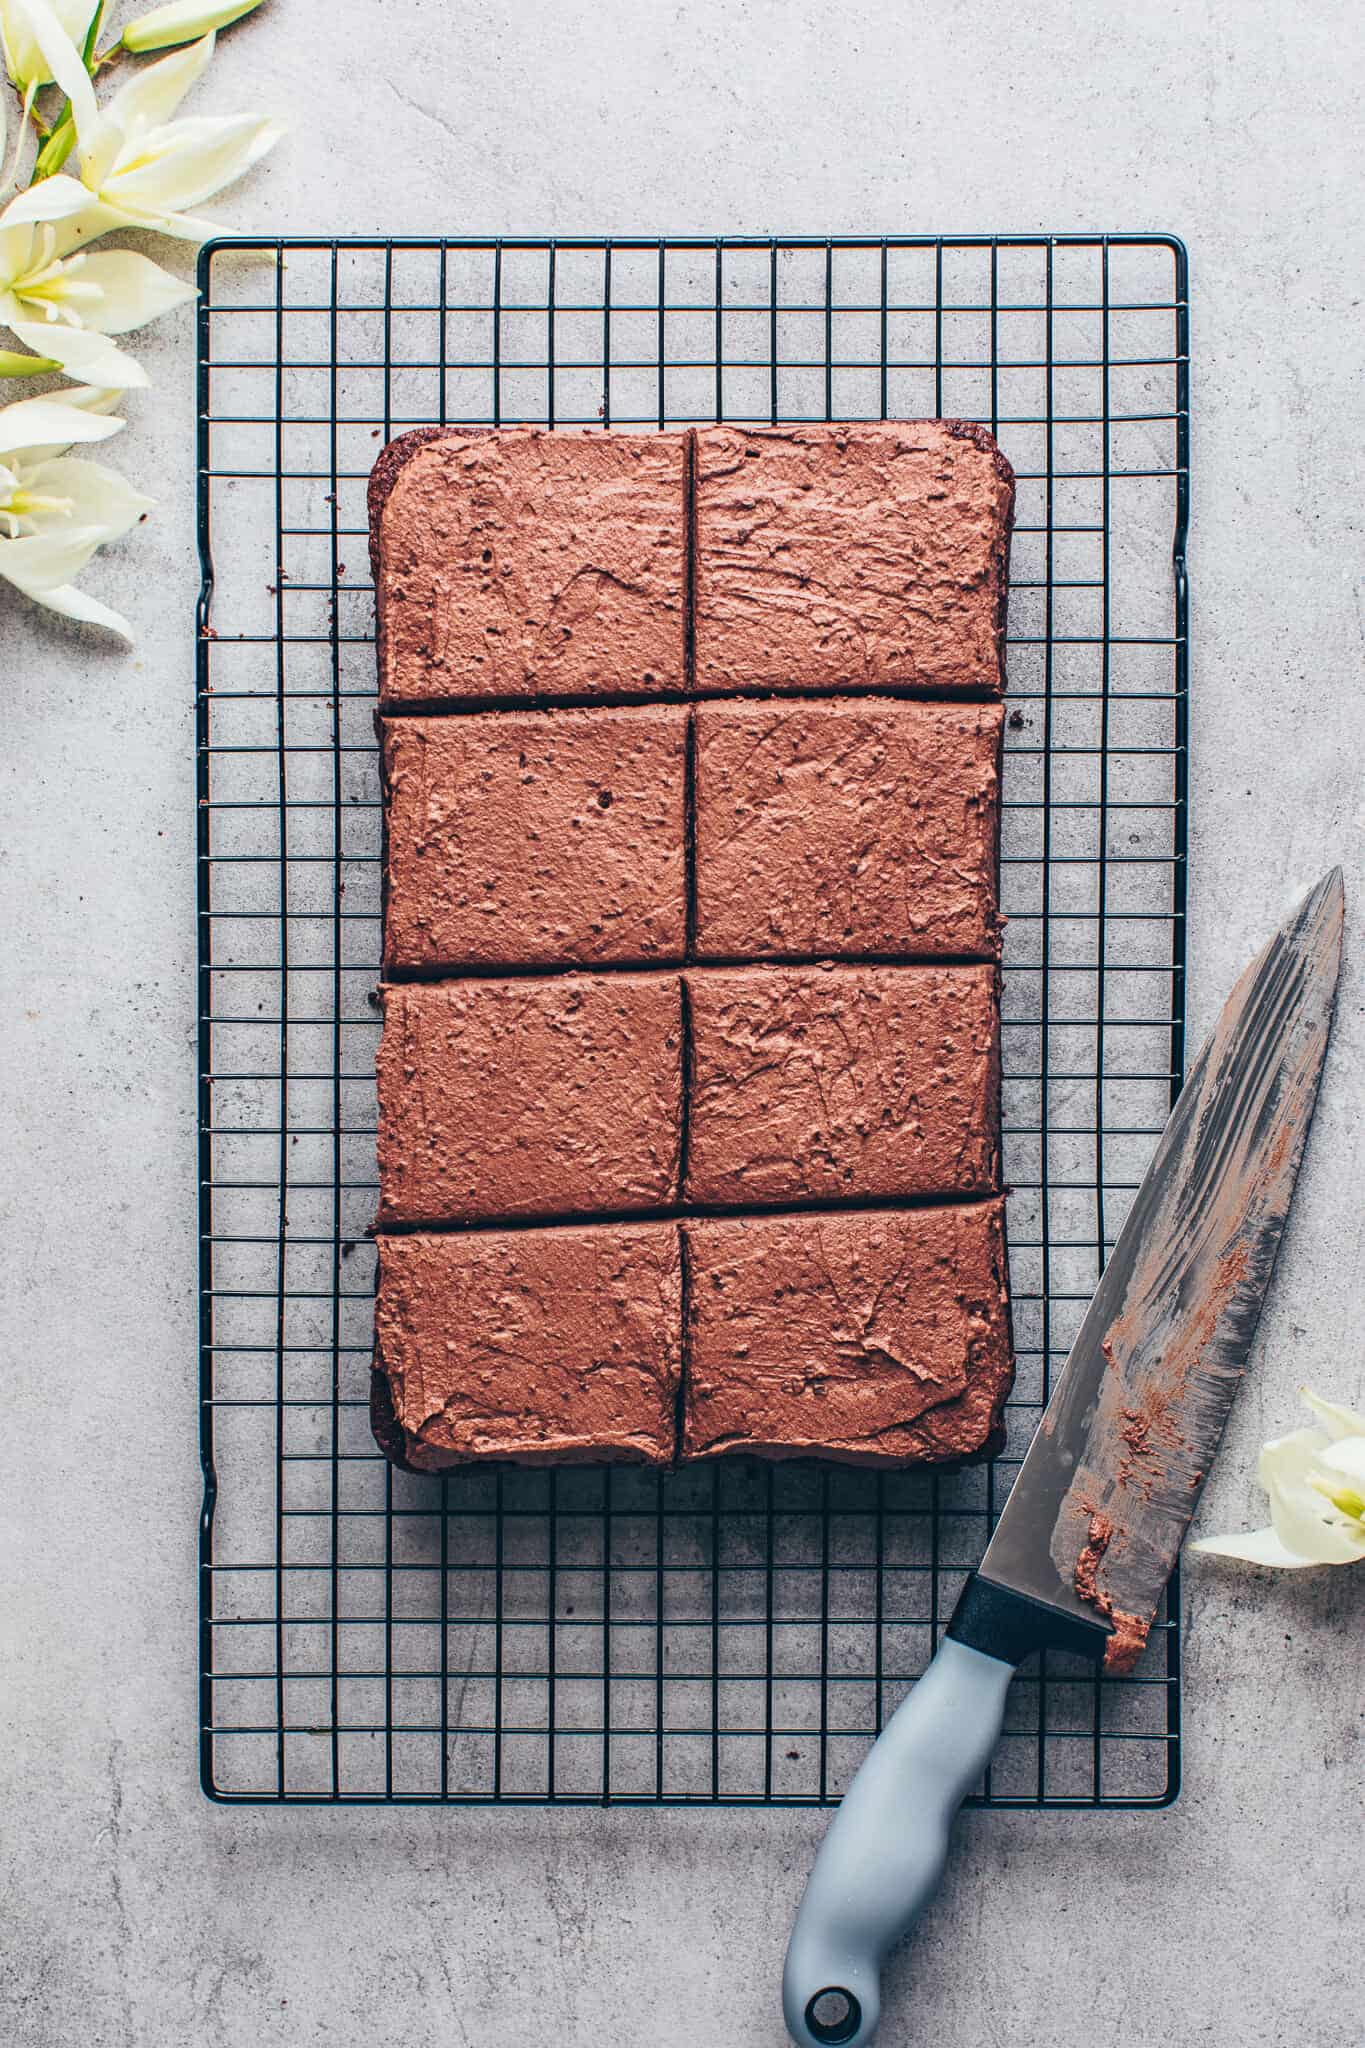 Chocolate cake with chocolate frosting. Vegan brownie sheet cake.